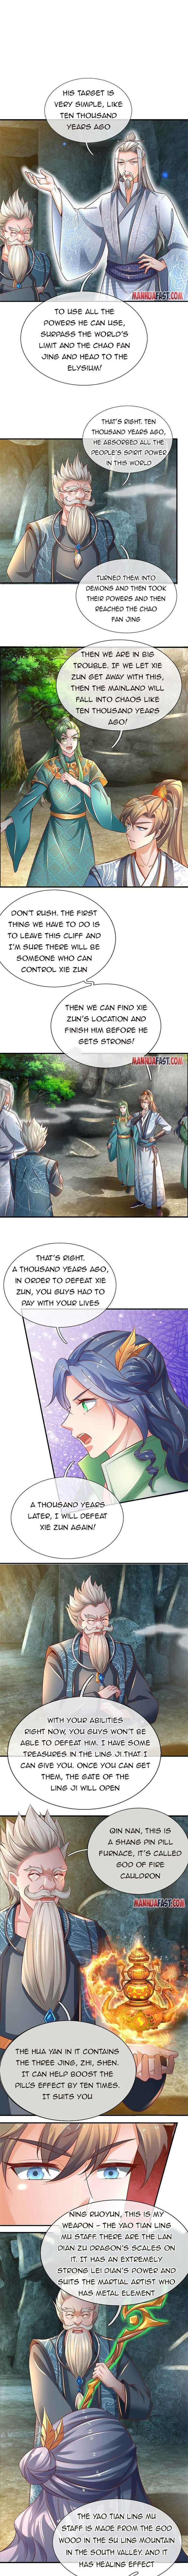 Marvelous Hero Of The Sword Chapter 345 page 2 - Mangakakalots.com